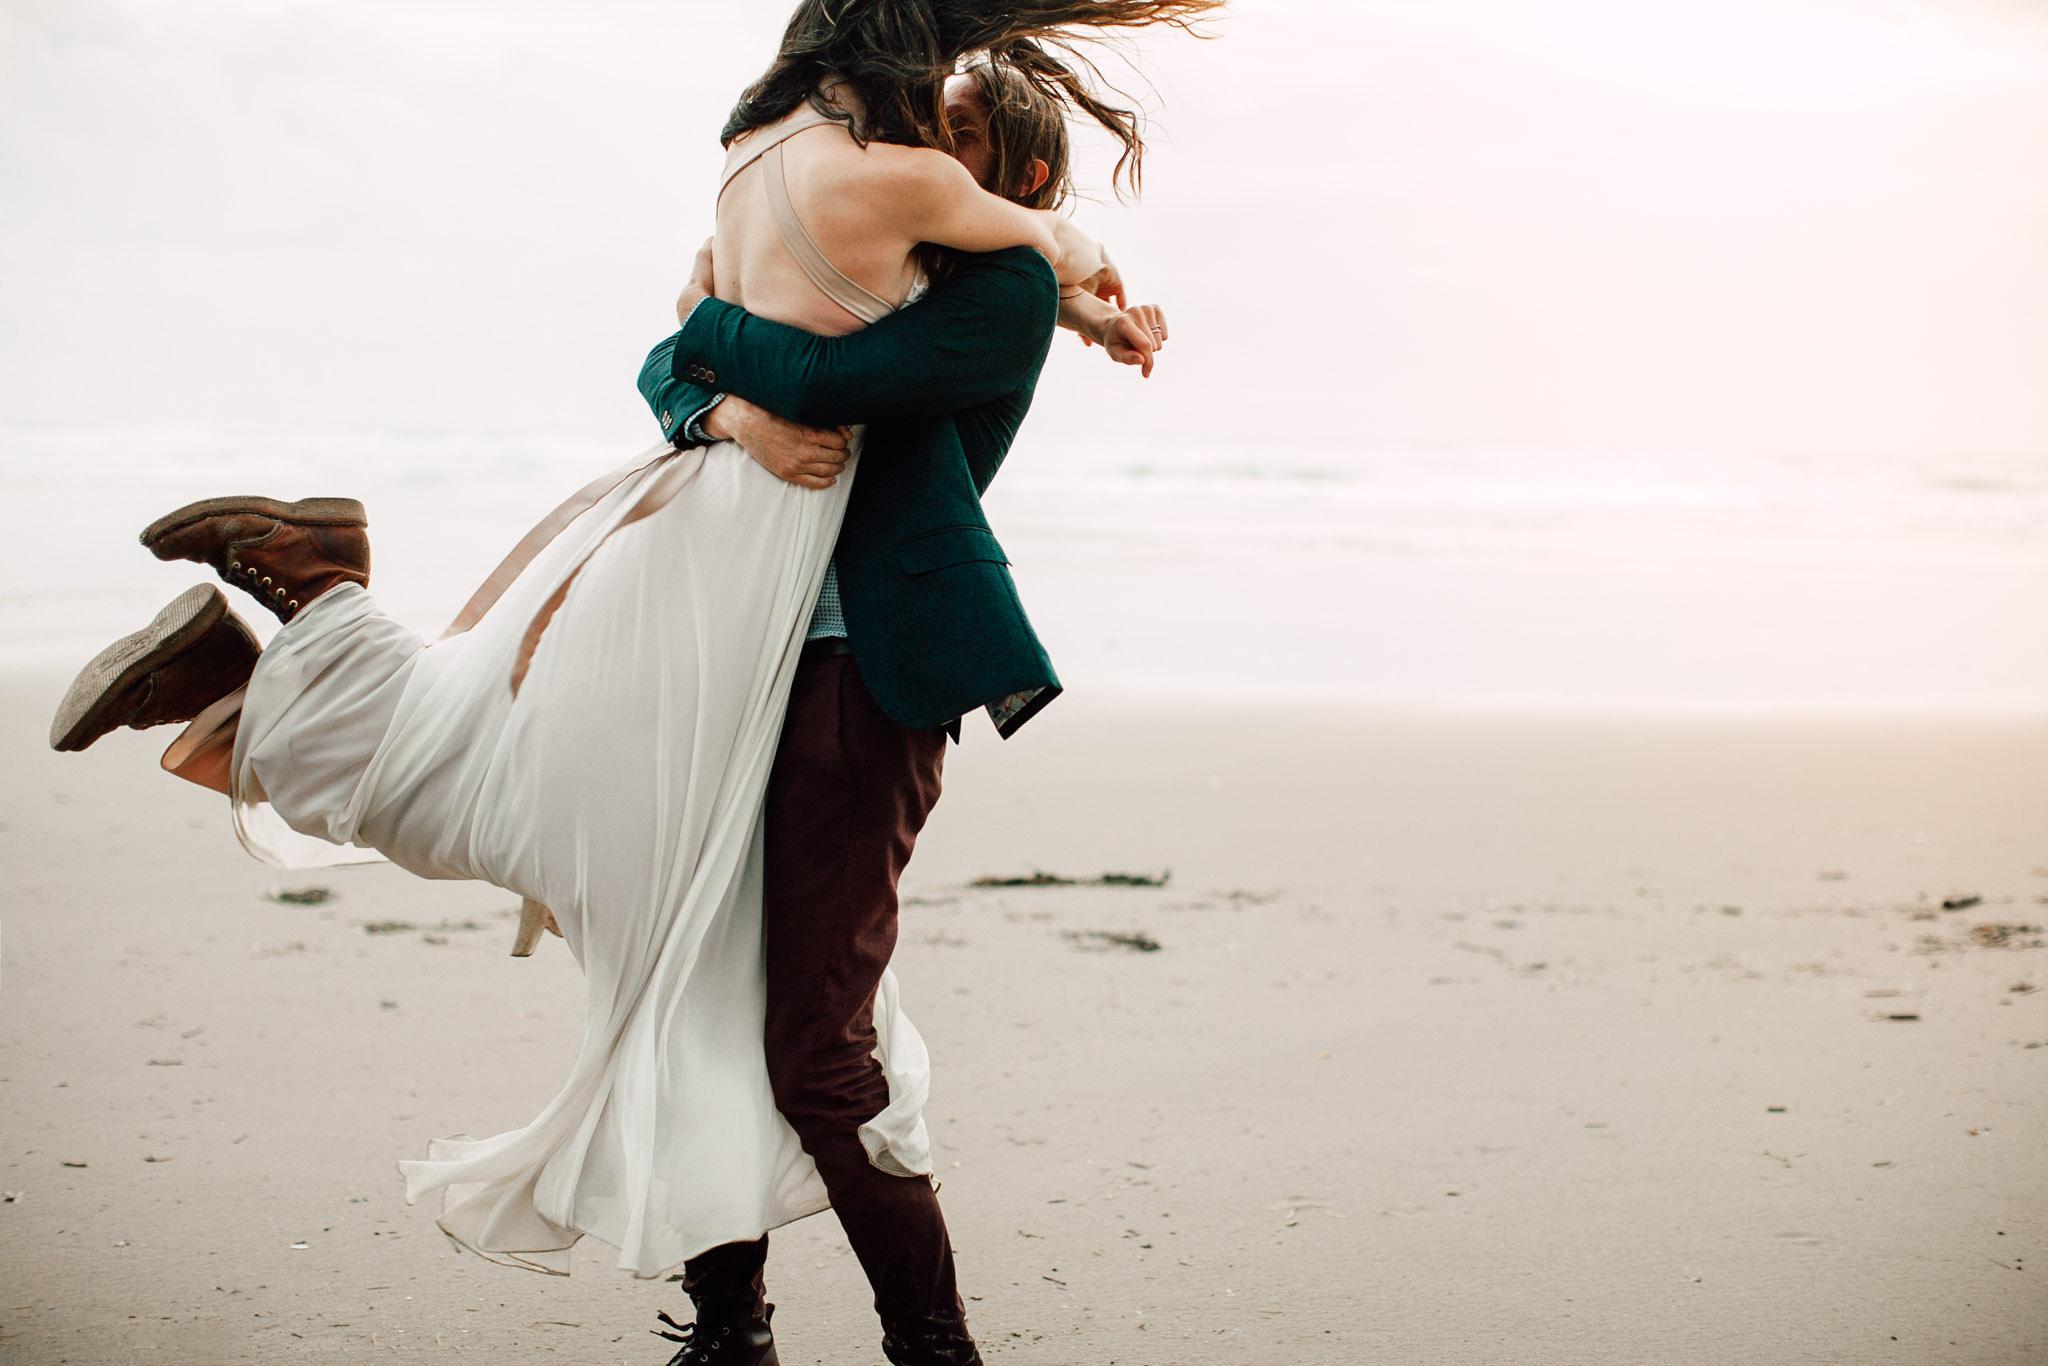 Oregon-Coast-Manzanita-Beach-Engagement-Pia-Anna-Christian-Wedding-Photography-PNW-GB-9.jpg